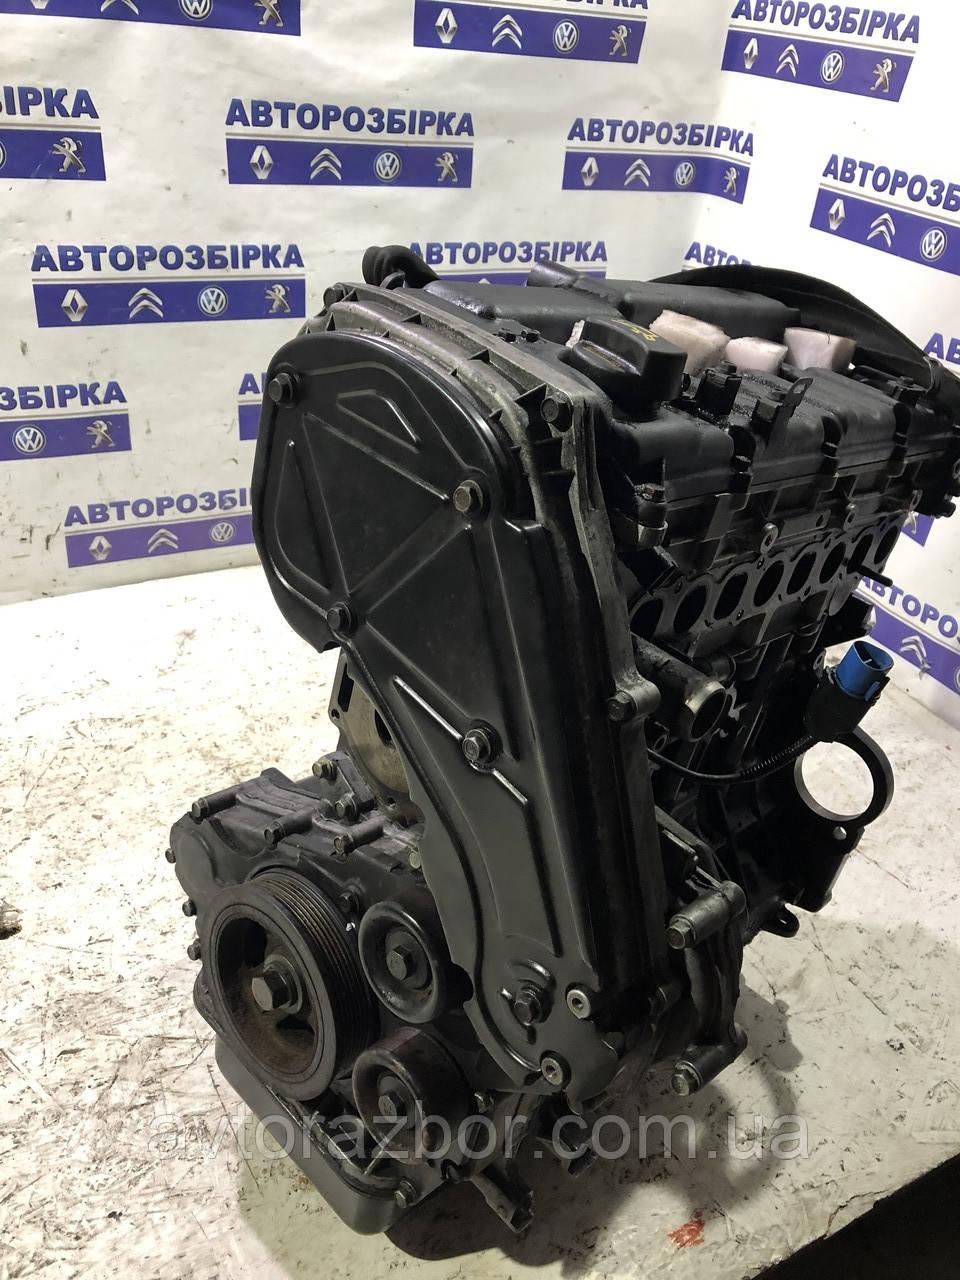 Двигатель мотор двигун 2.5 CRDI Kia Sorento 2006 2007 2008 2009 Киа Соренто